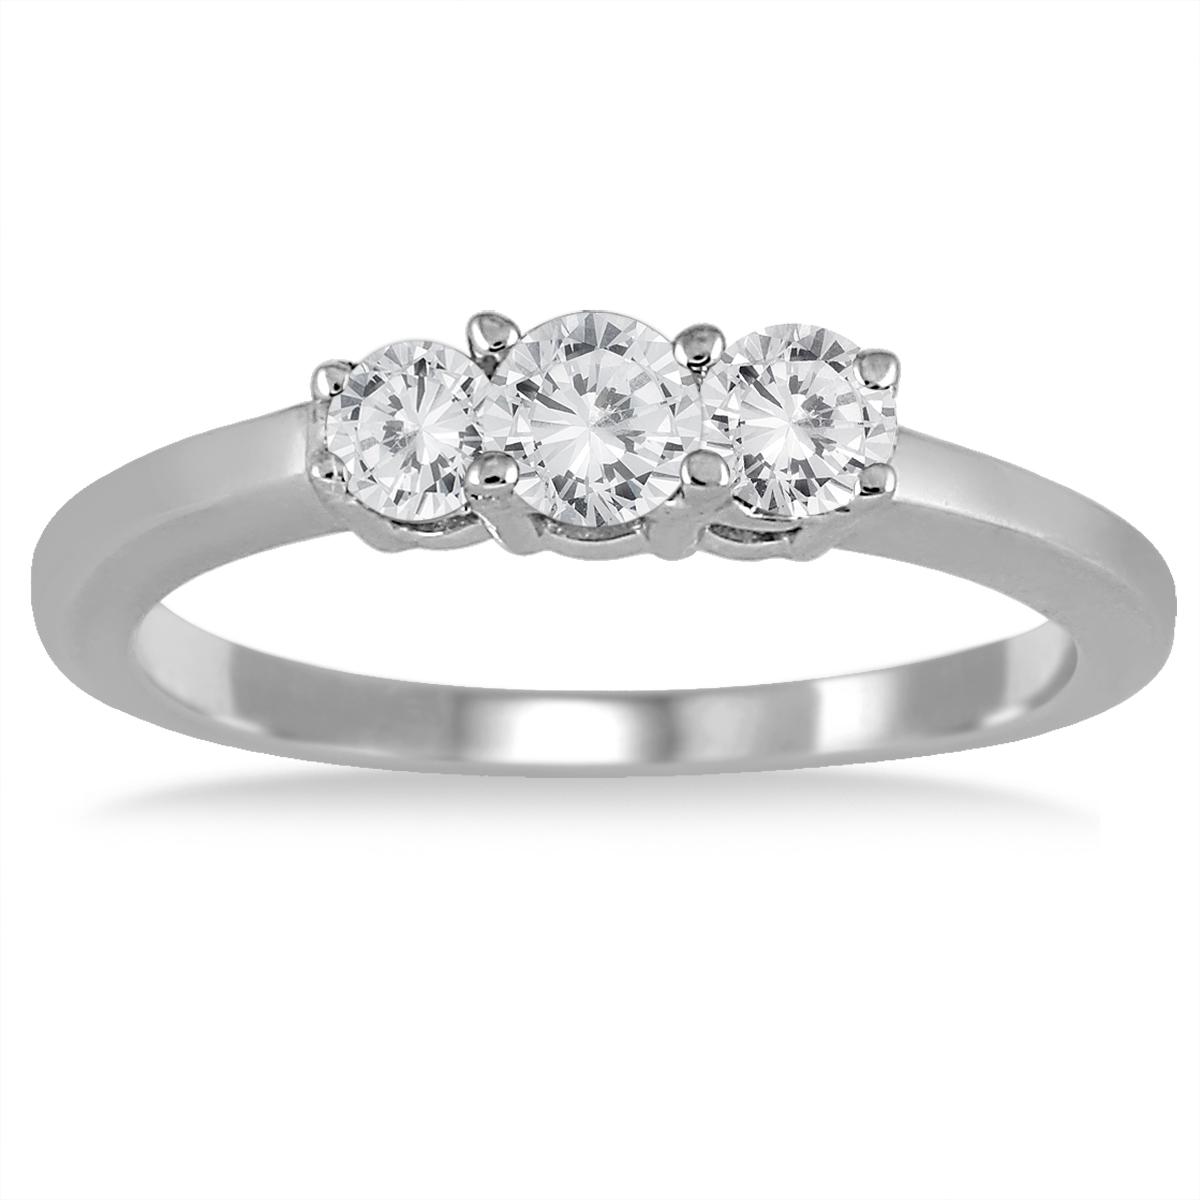 1/2 Carat Three Stone Diamond Ring in .925 Sterling Silver